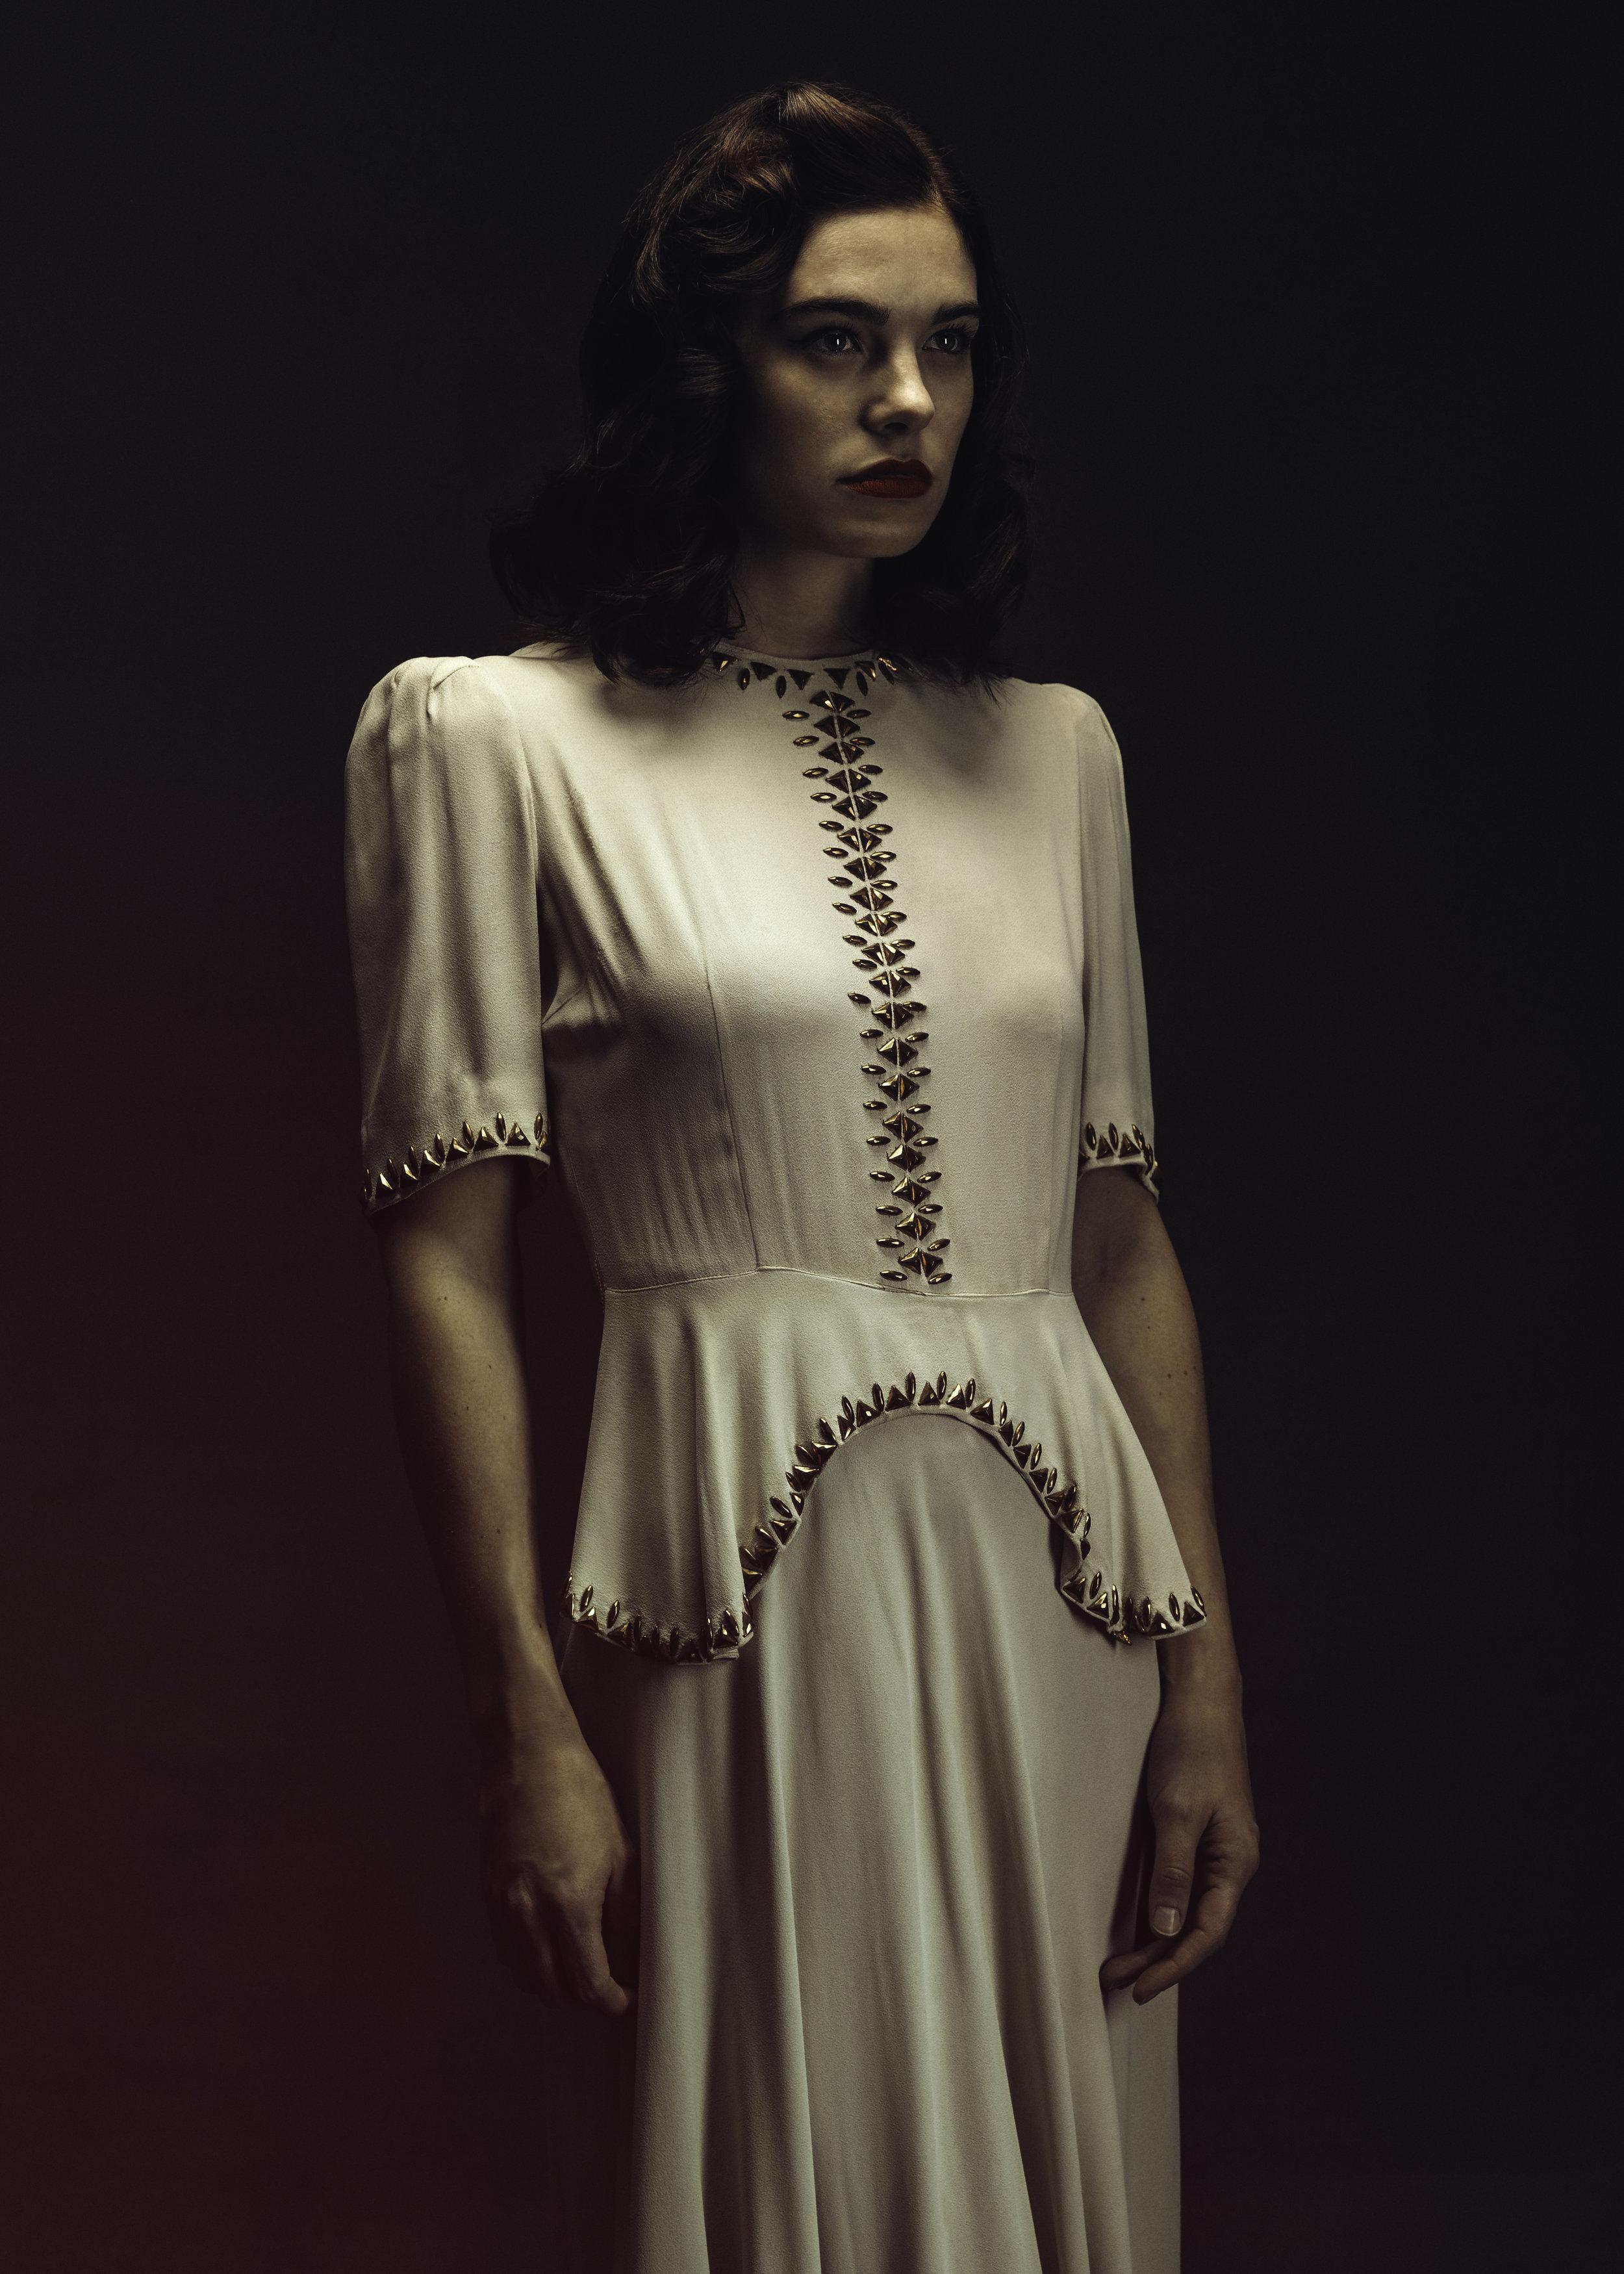 white stud dress final.jpg